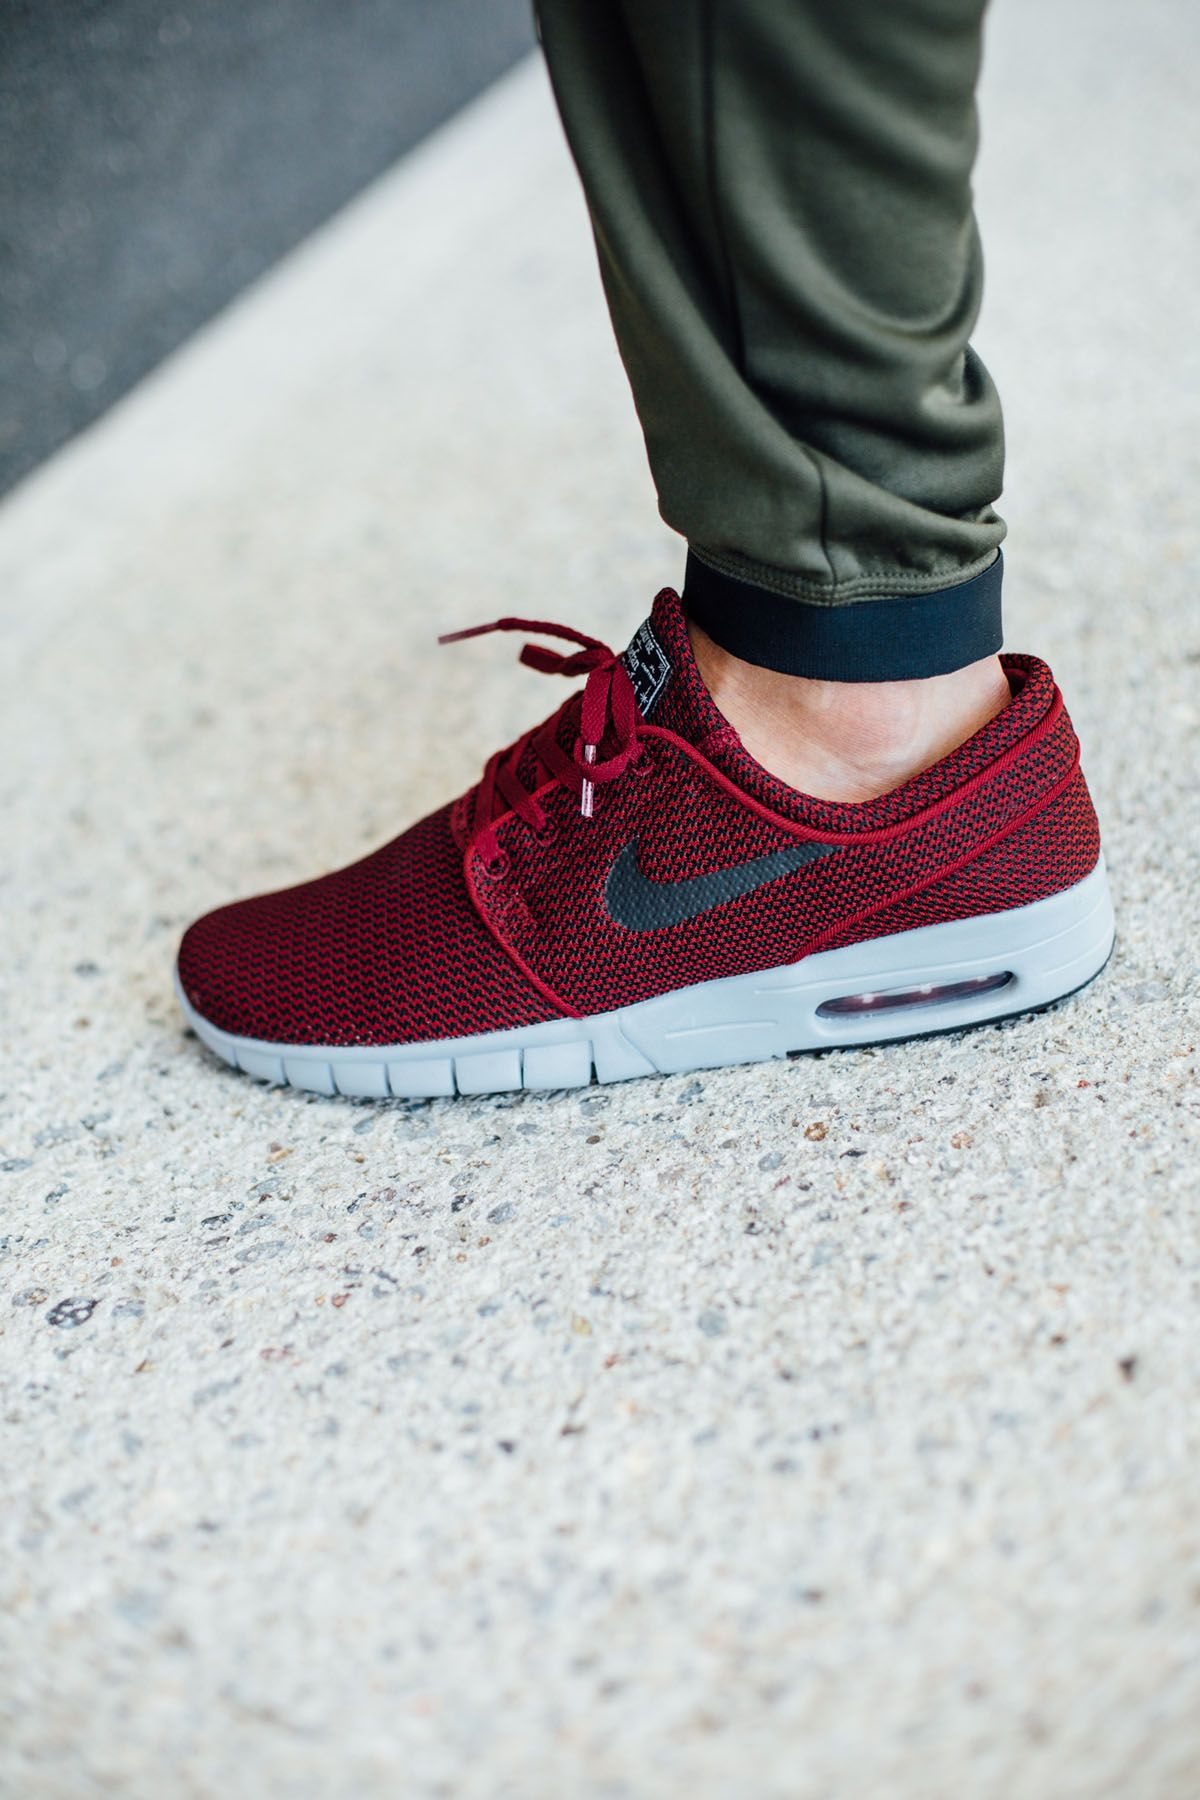 rosh run nike homme - Nike SB STEFAN JANOSKI MAX (Black / Black - Pine Green) | Outfit ...